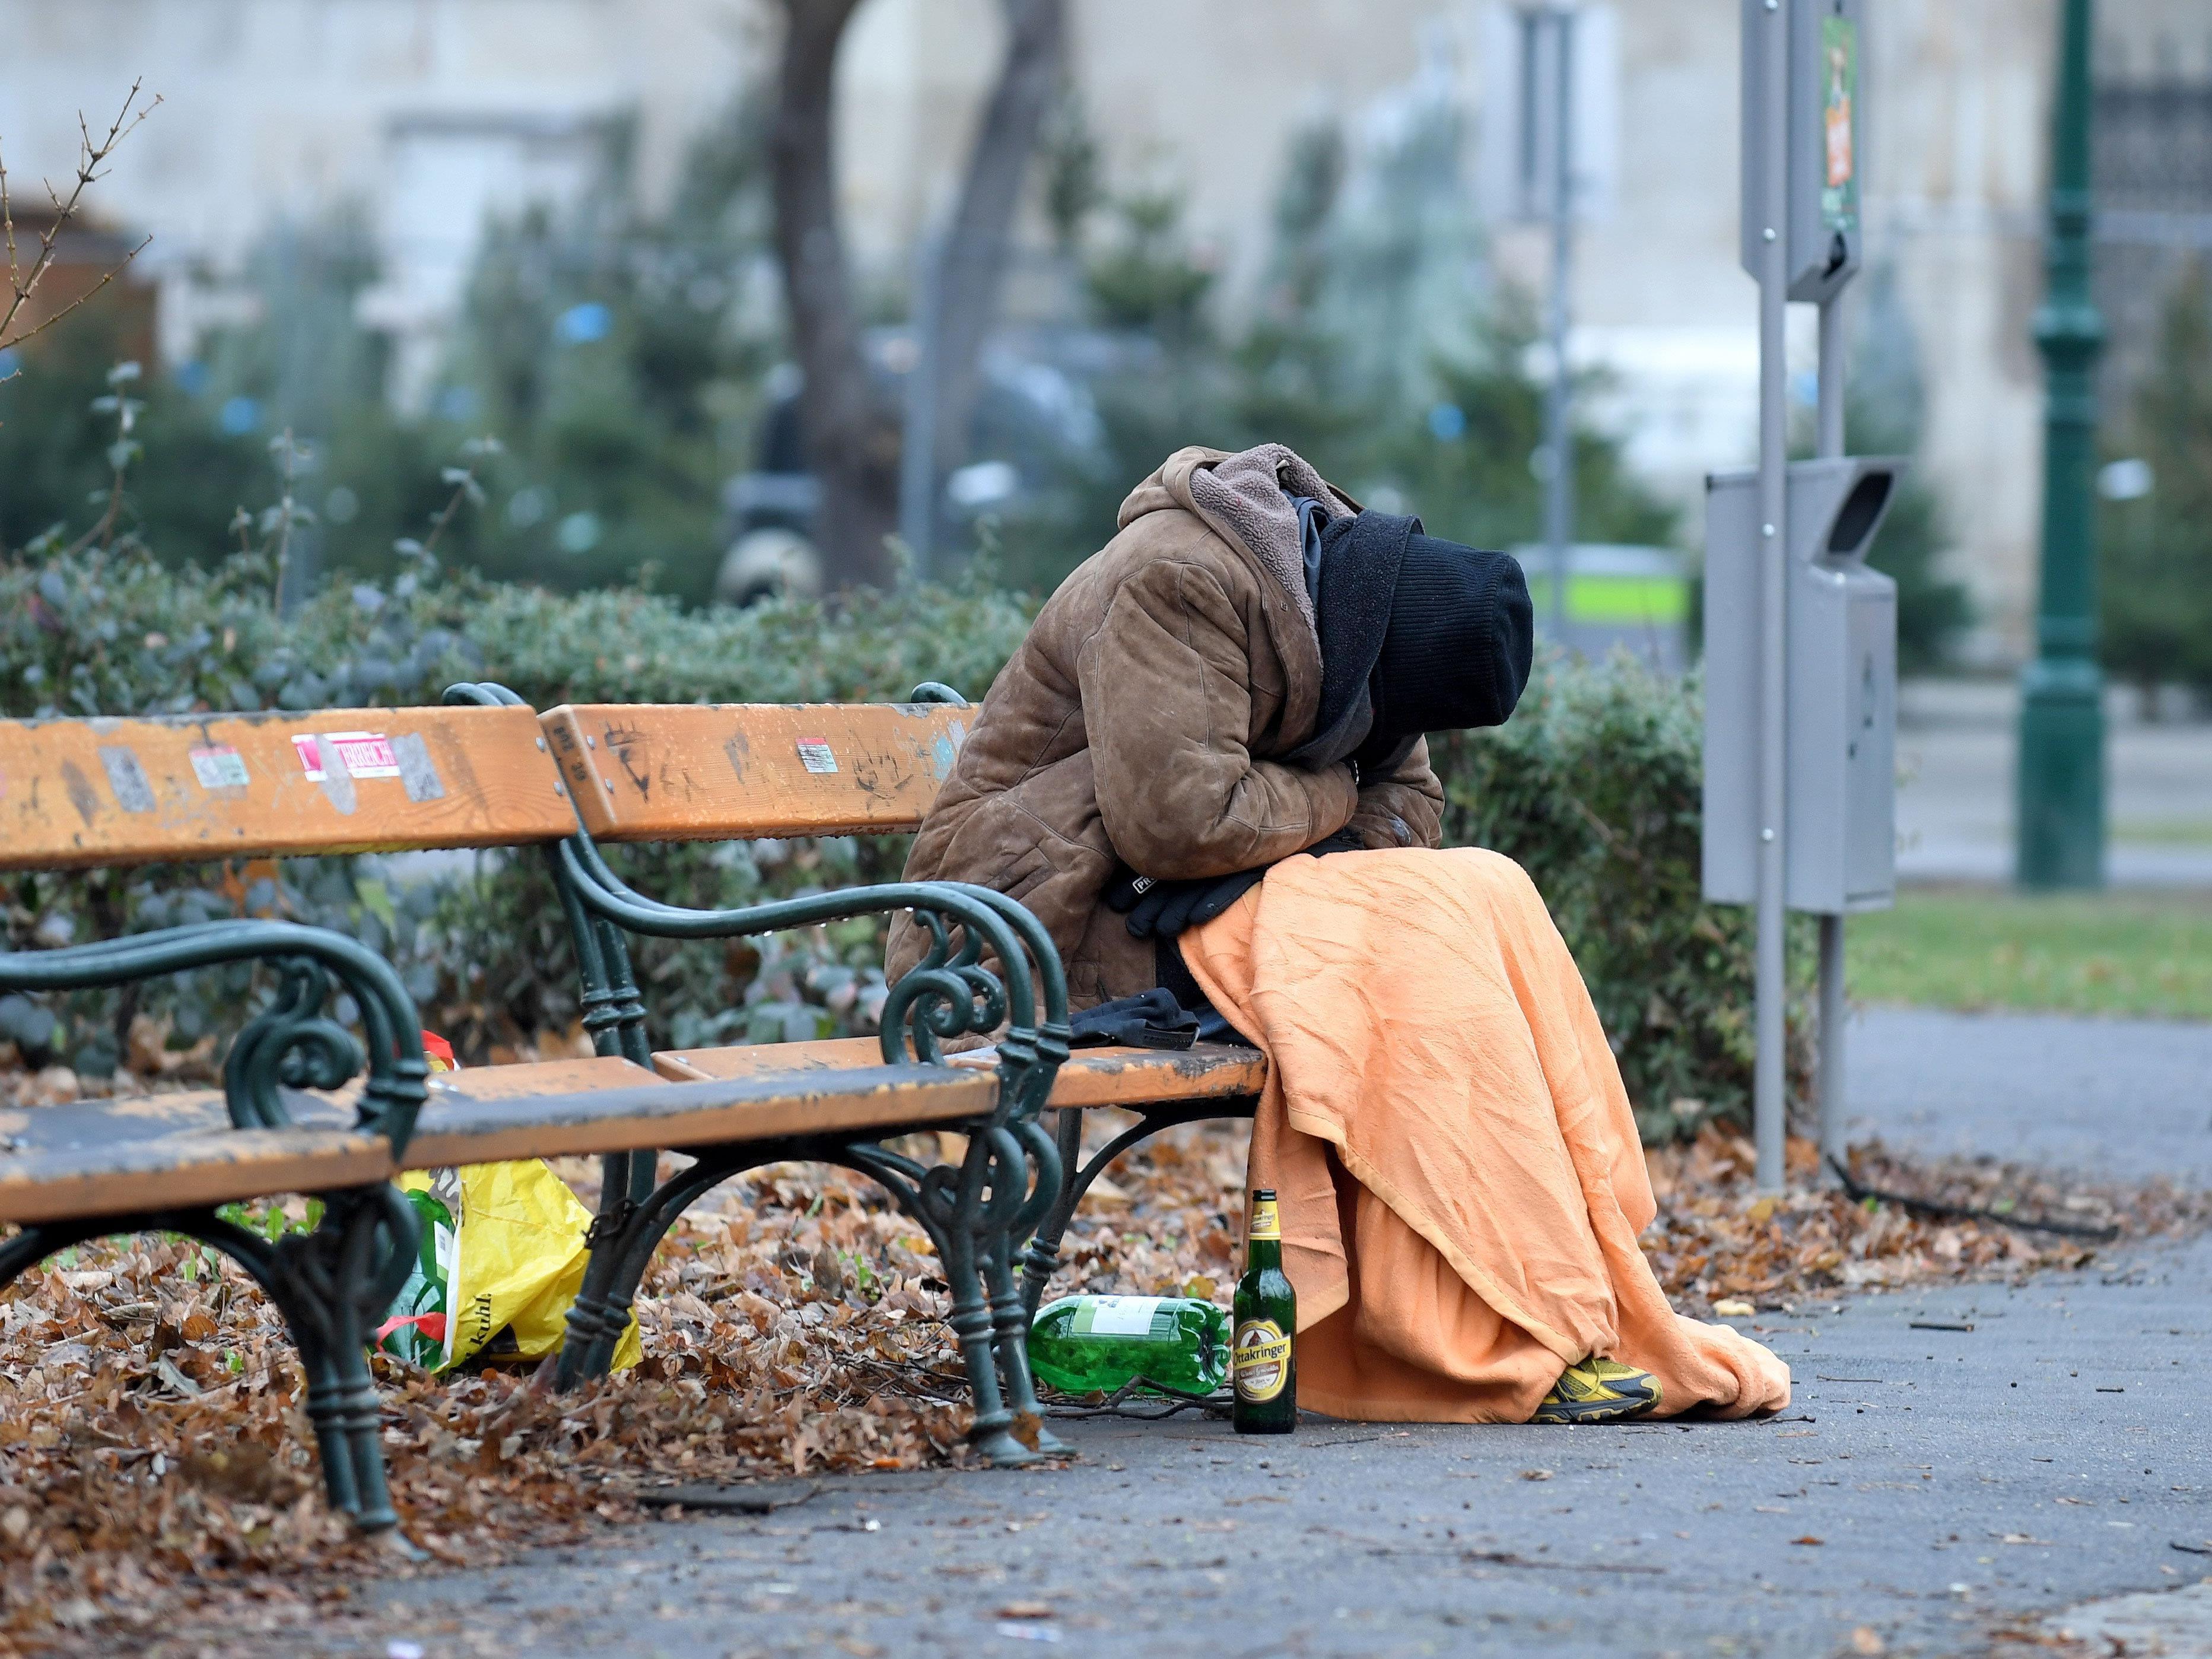 Wer in Wien obdachlos ist, kann vielerorts Hilfe bekommen